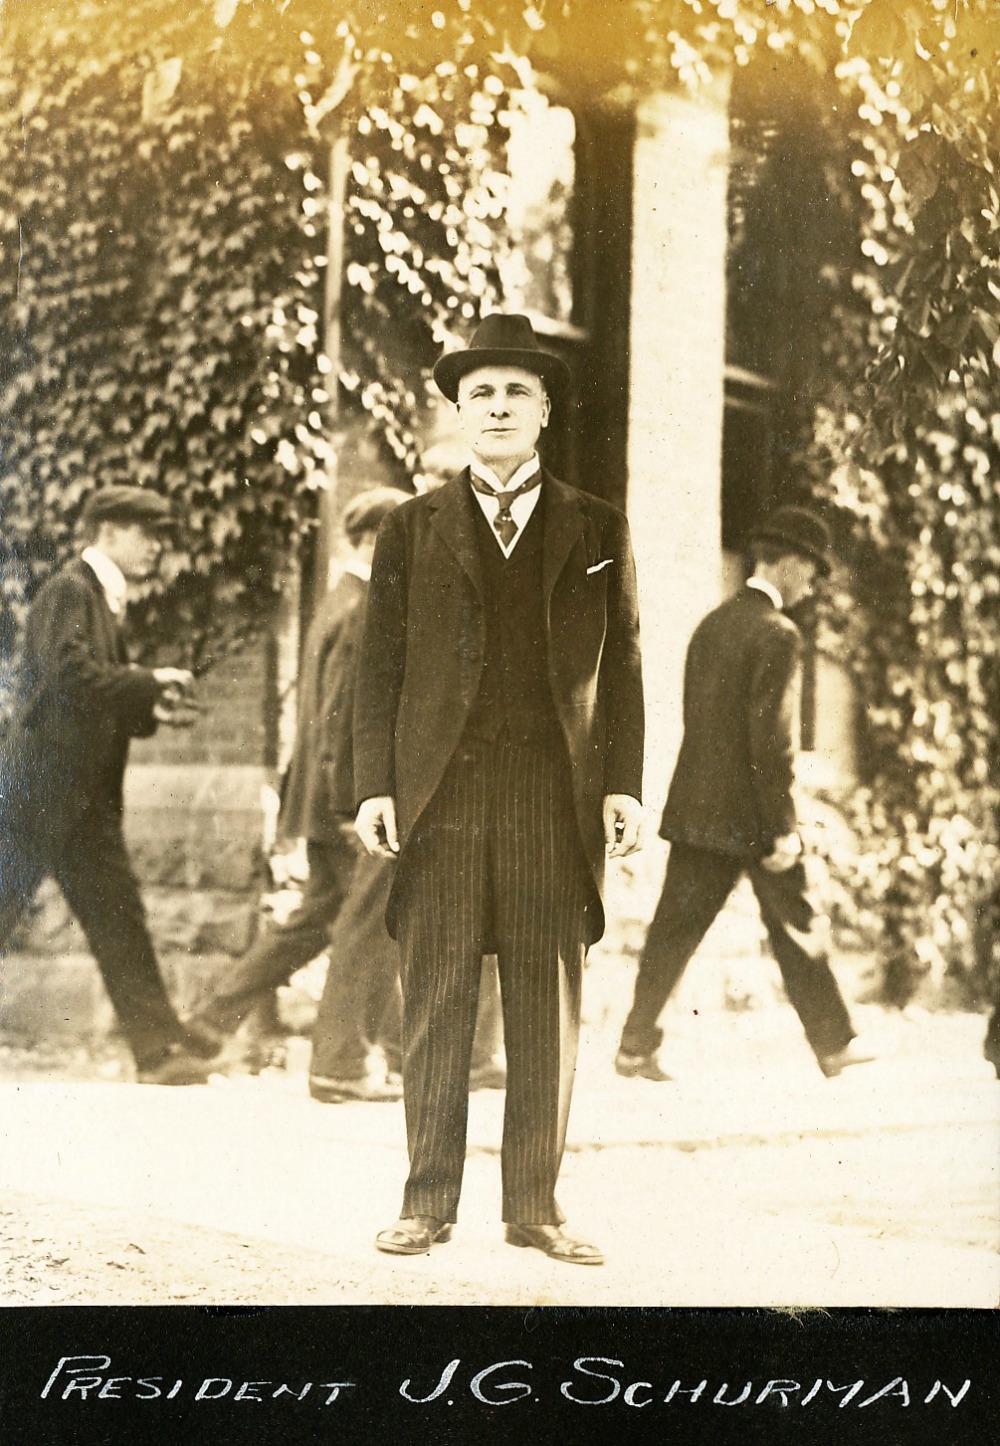 CU President Shurmann | Circa 1915